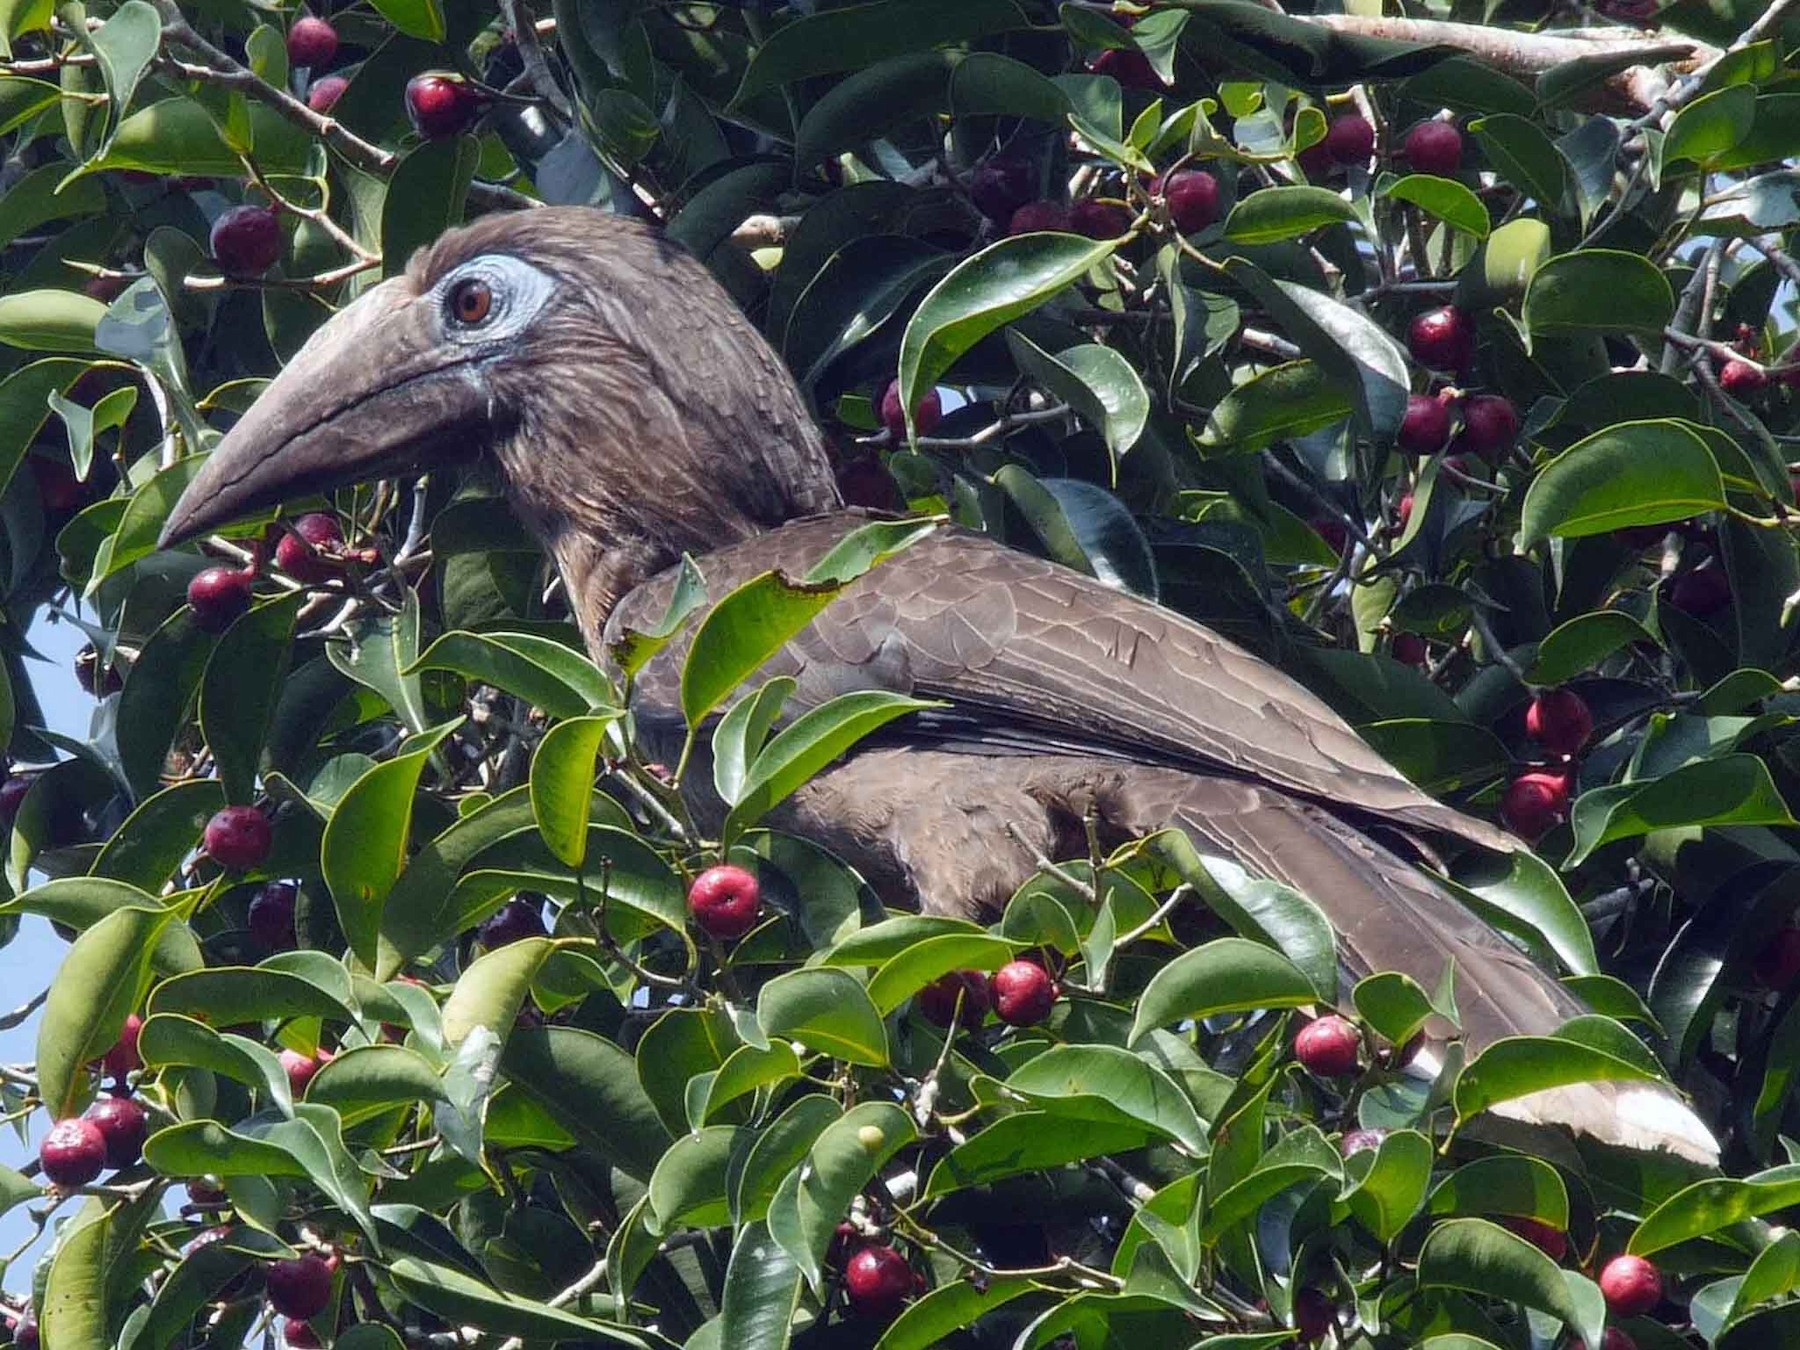 Rusty-cheeked Hornbill - Josep del Hoyo